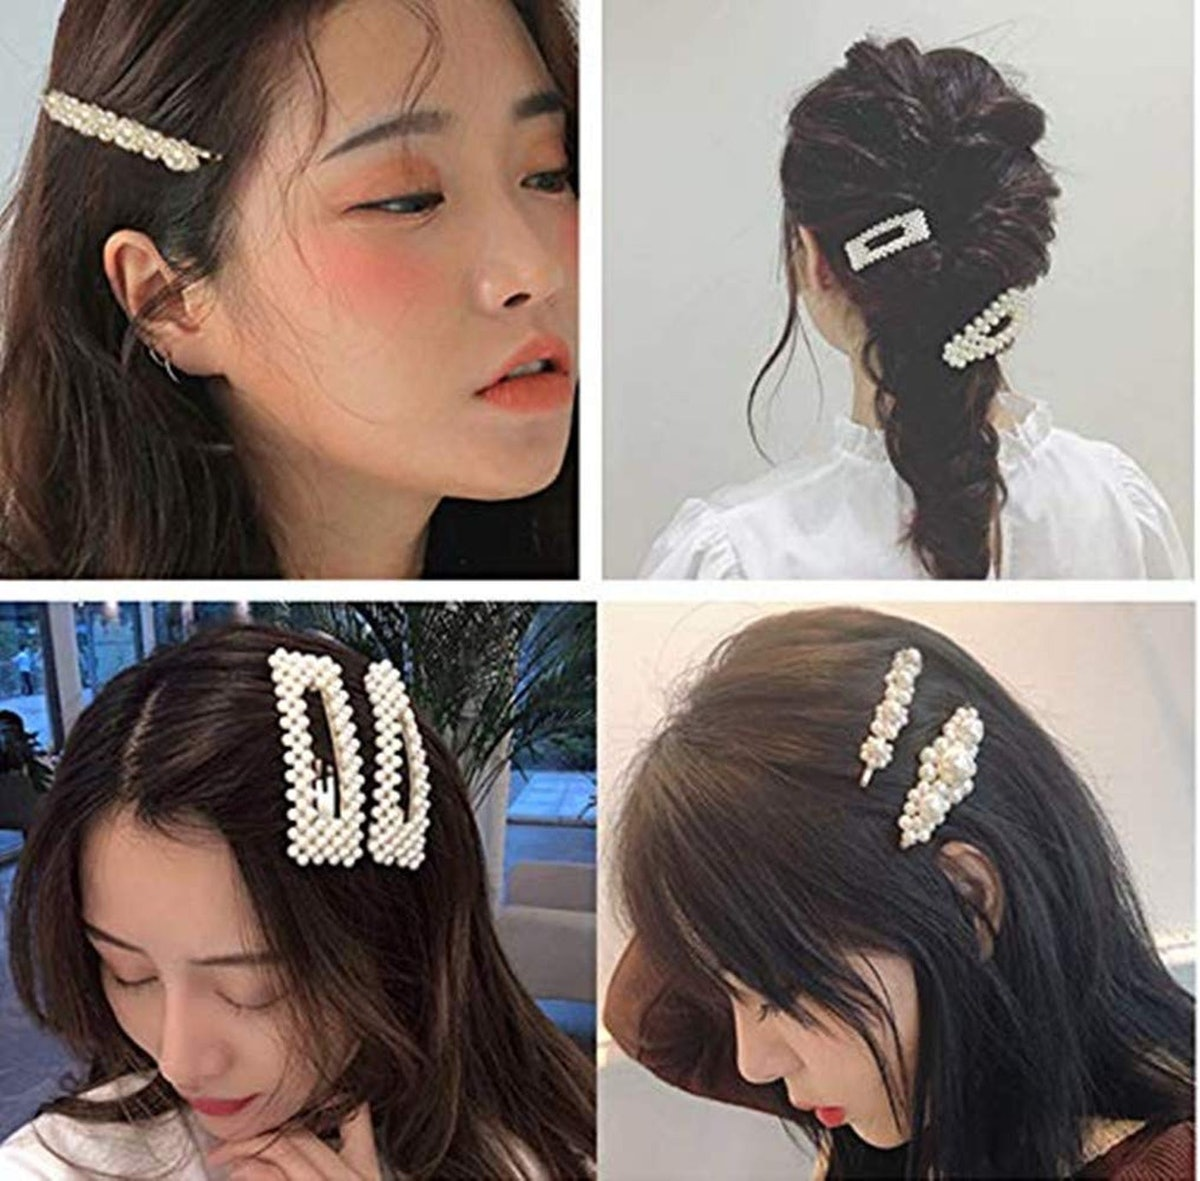 MXXGMMYJ Oversized Pearl Hair Clips (4 Pack)